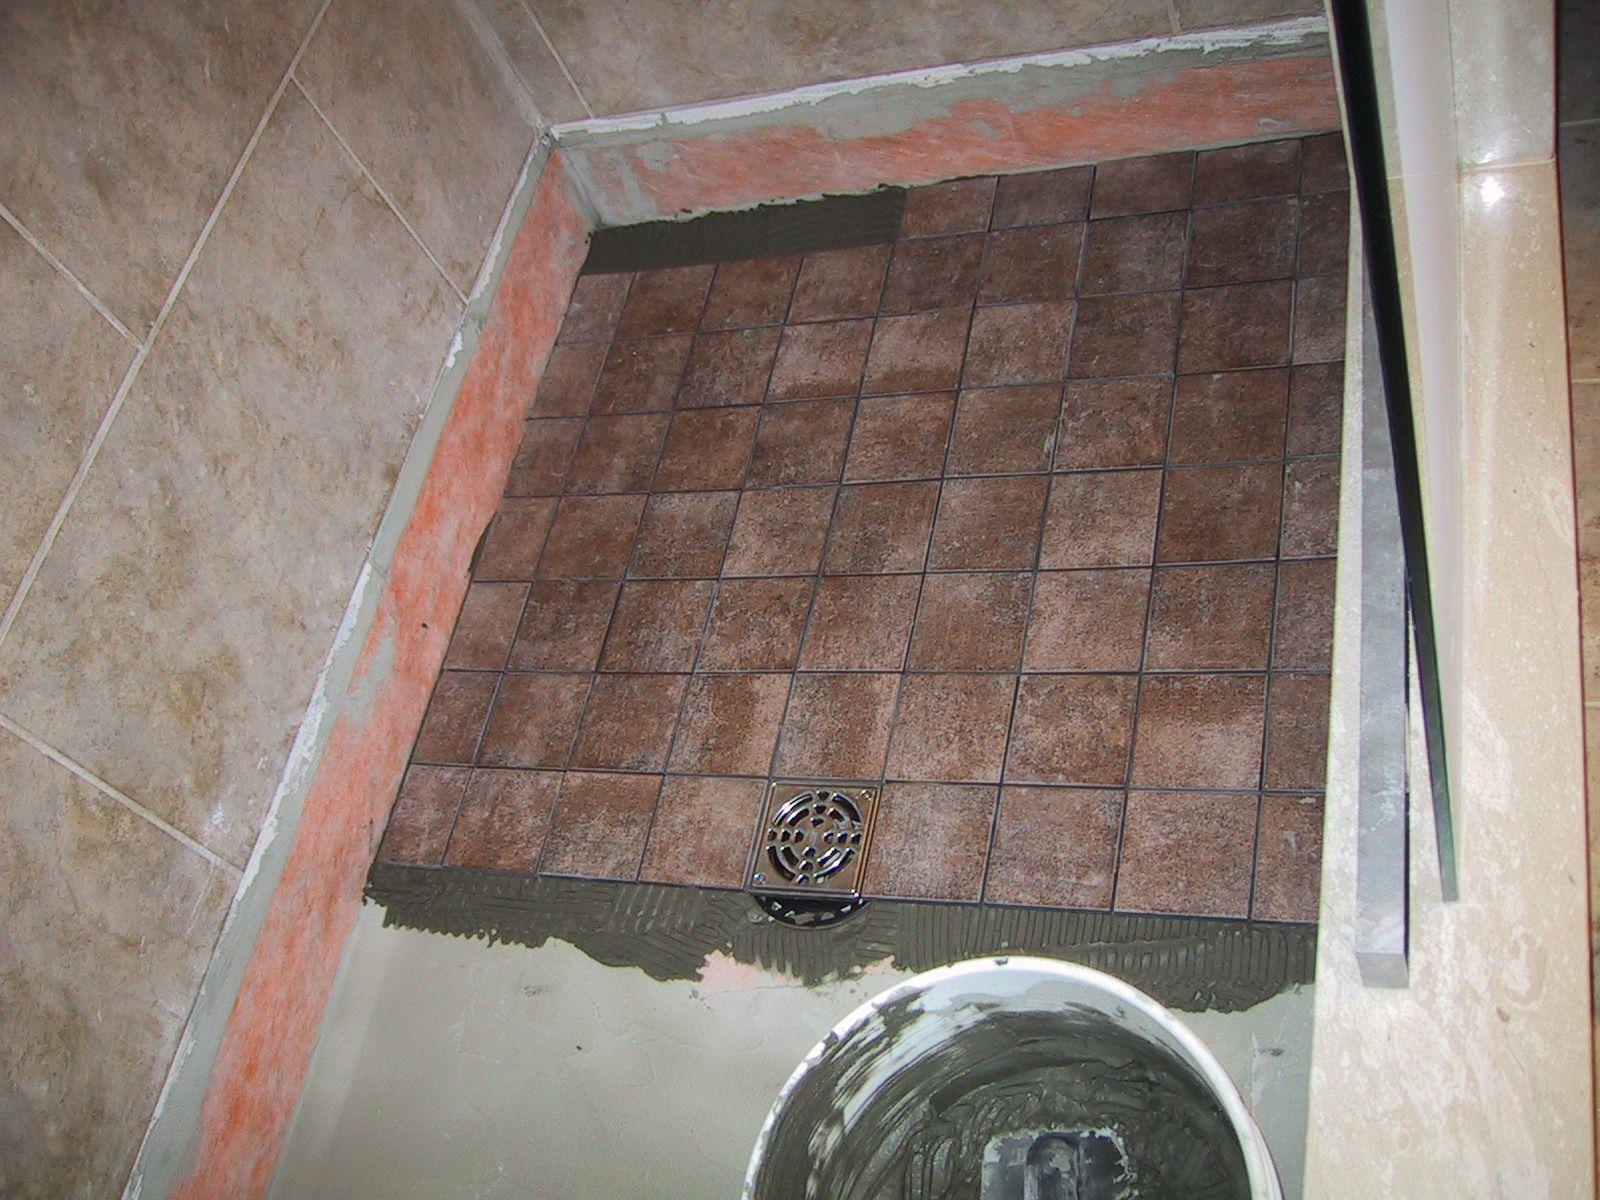 Bathroom tile ideas shower tile photos pictures of interior bathroom tile ideas shower tile photos pictures of interior designs dailygadgetfo Choice Image